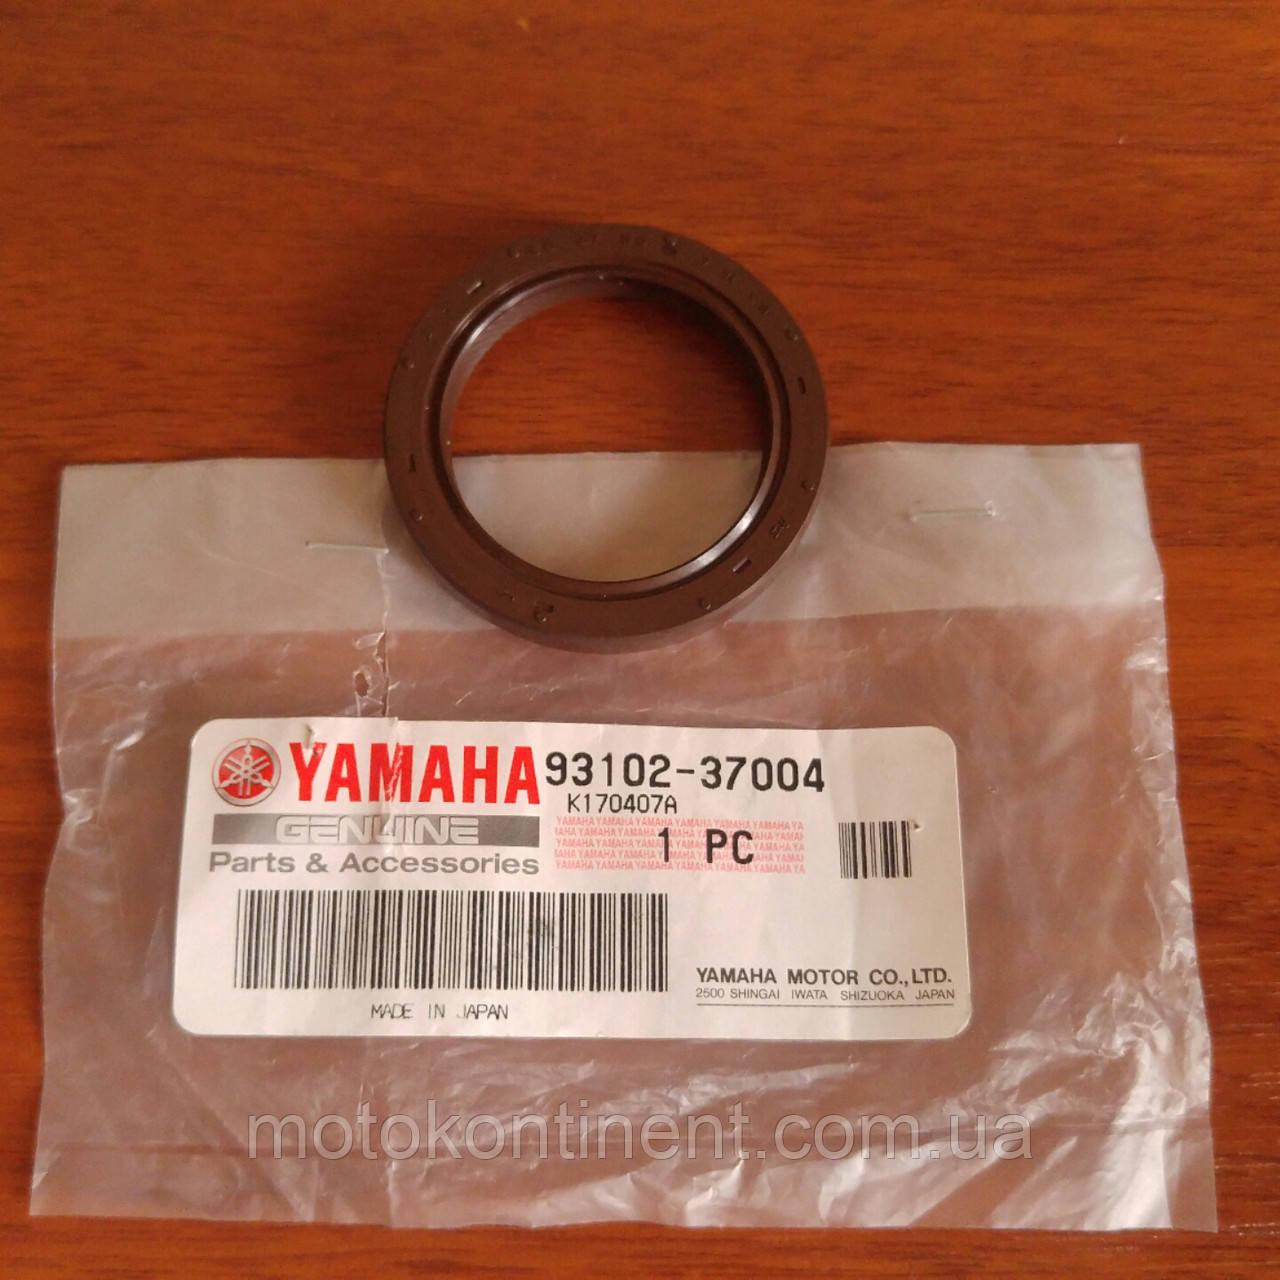 93102-37004 Сальник коленвала верхний 37x50x7 Yamaha F9.9/F15/F20/F25